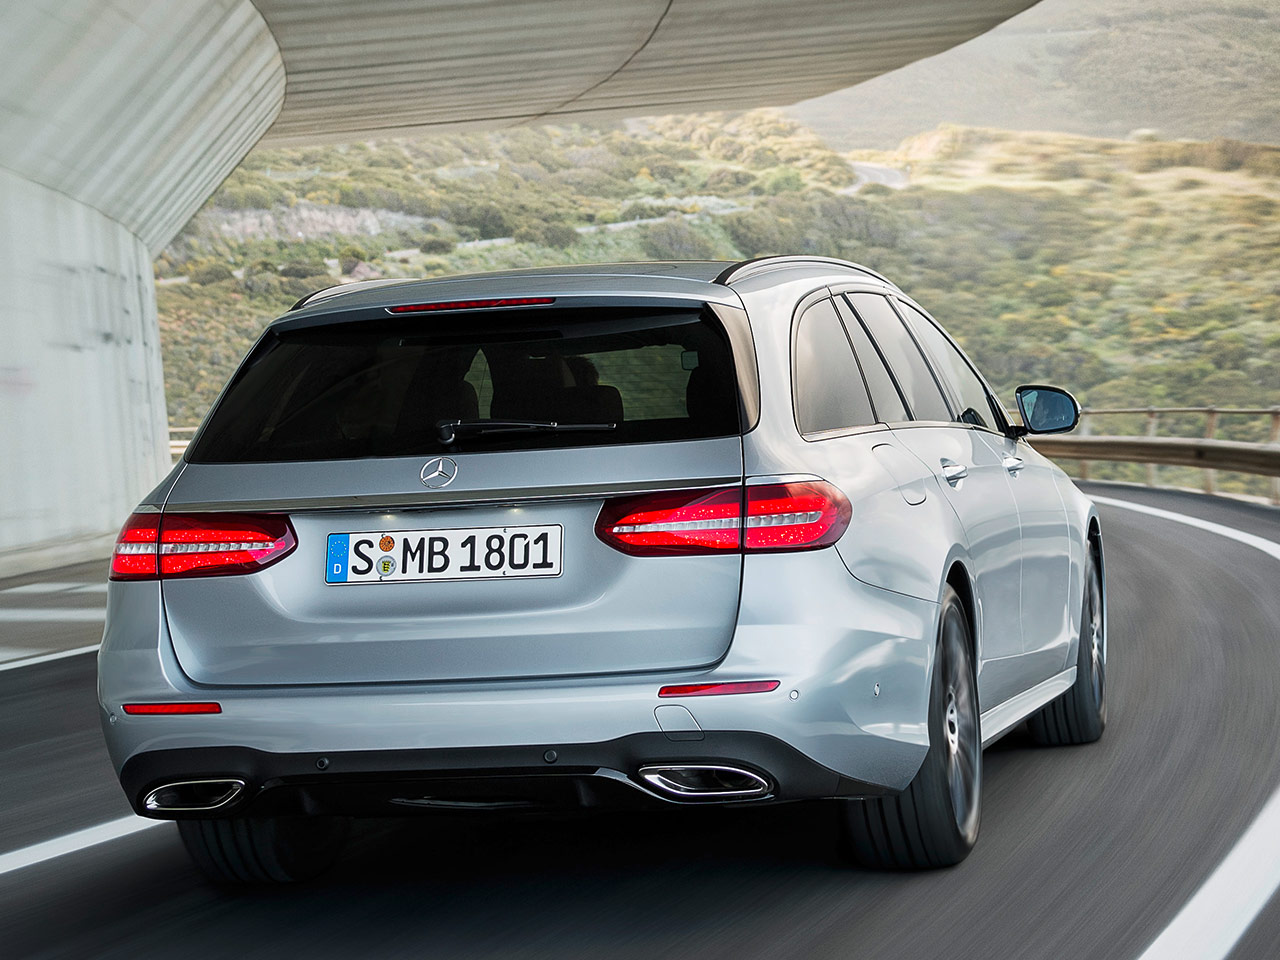 Mercedes E Klasse T Modell 2016 Preis Update Autozeitungde